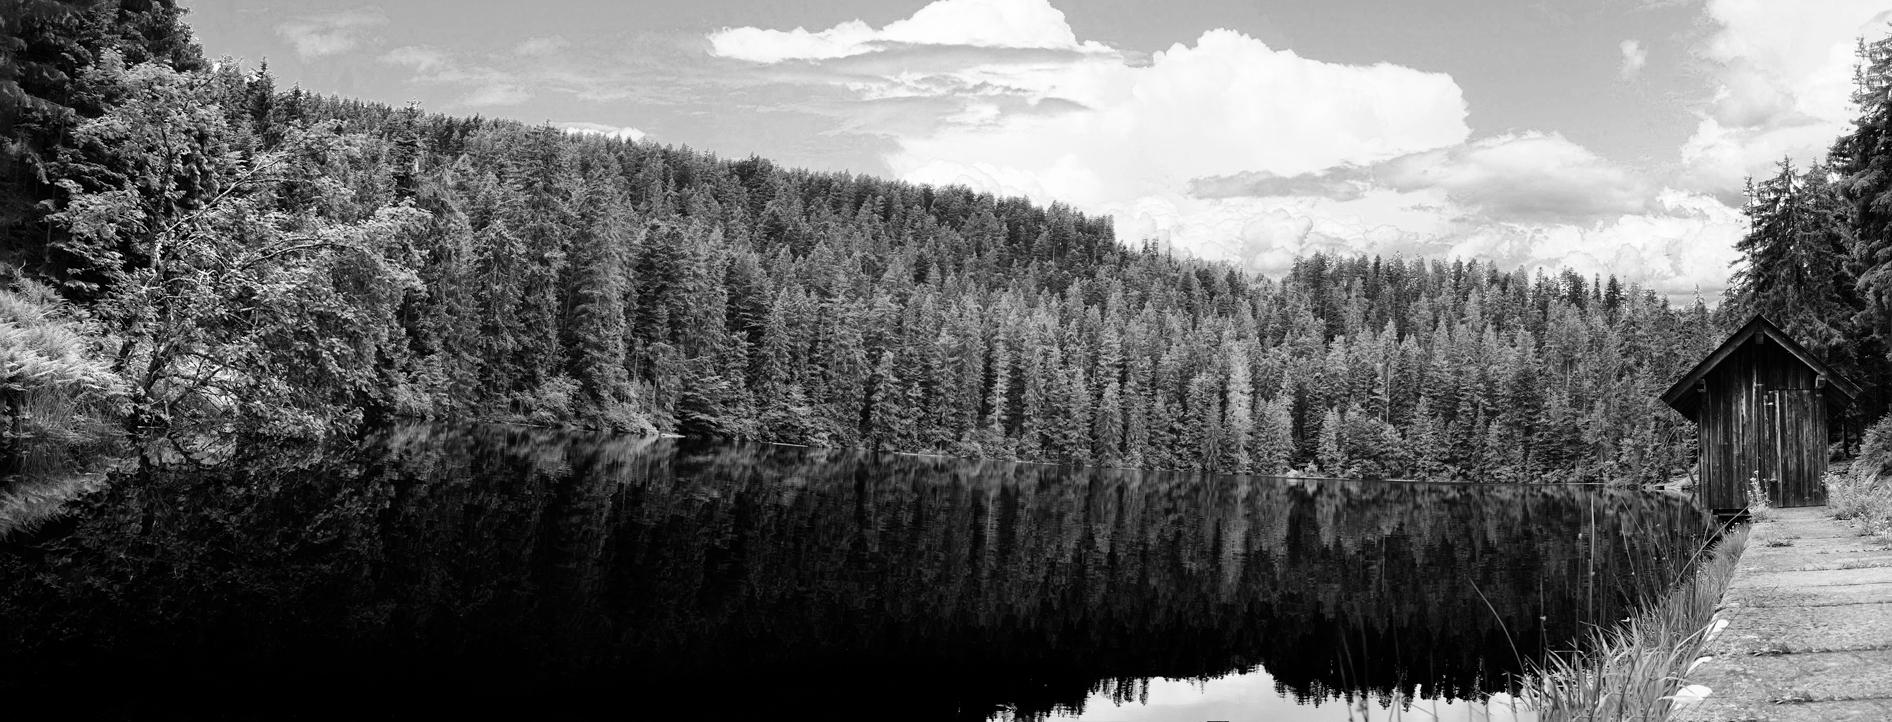 _glaswaldsee-pano.jpg